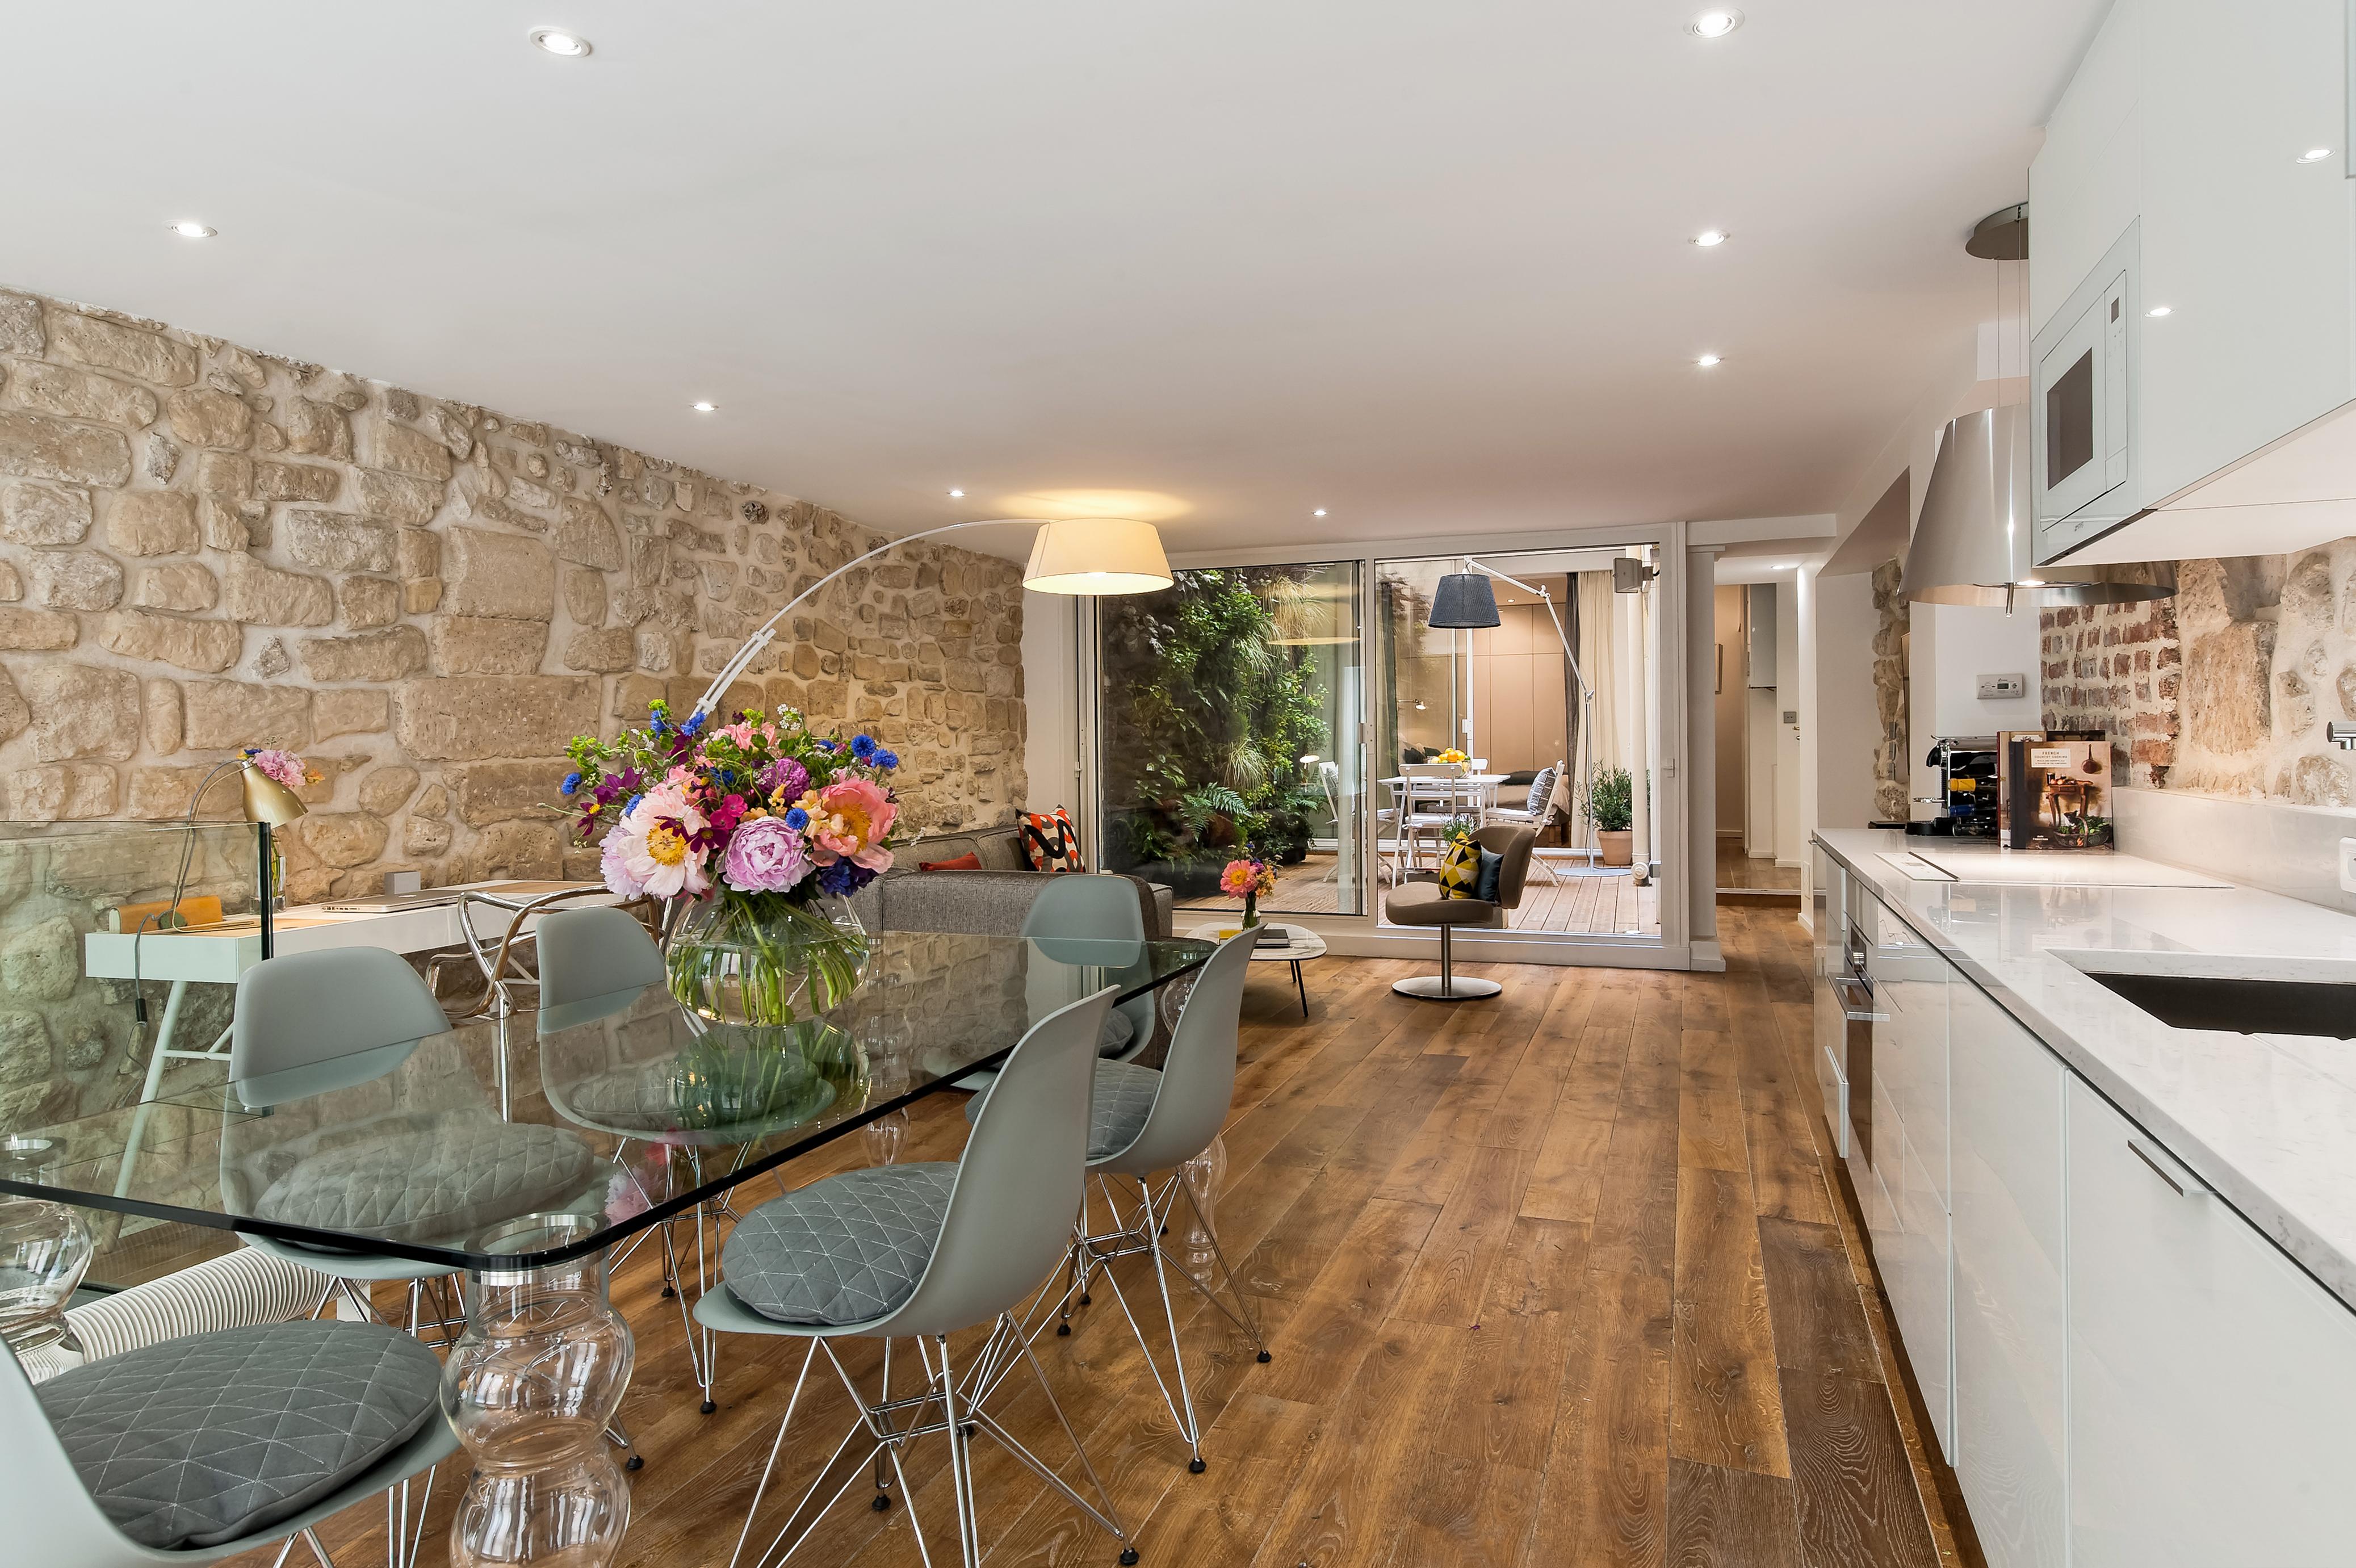 Paris Vacation Apartment Rental | Marais Garden Oasis | Haven in